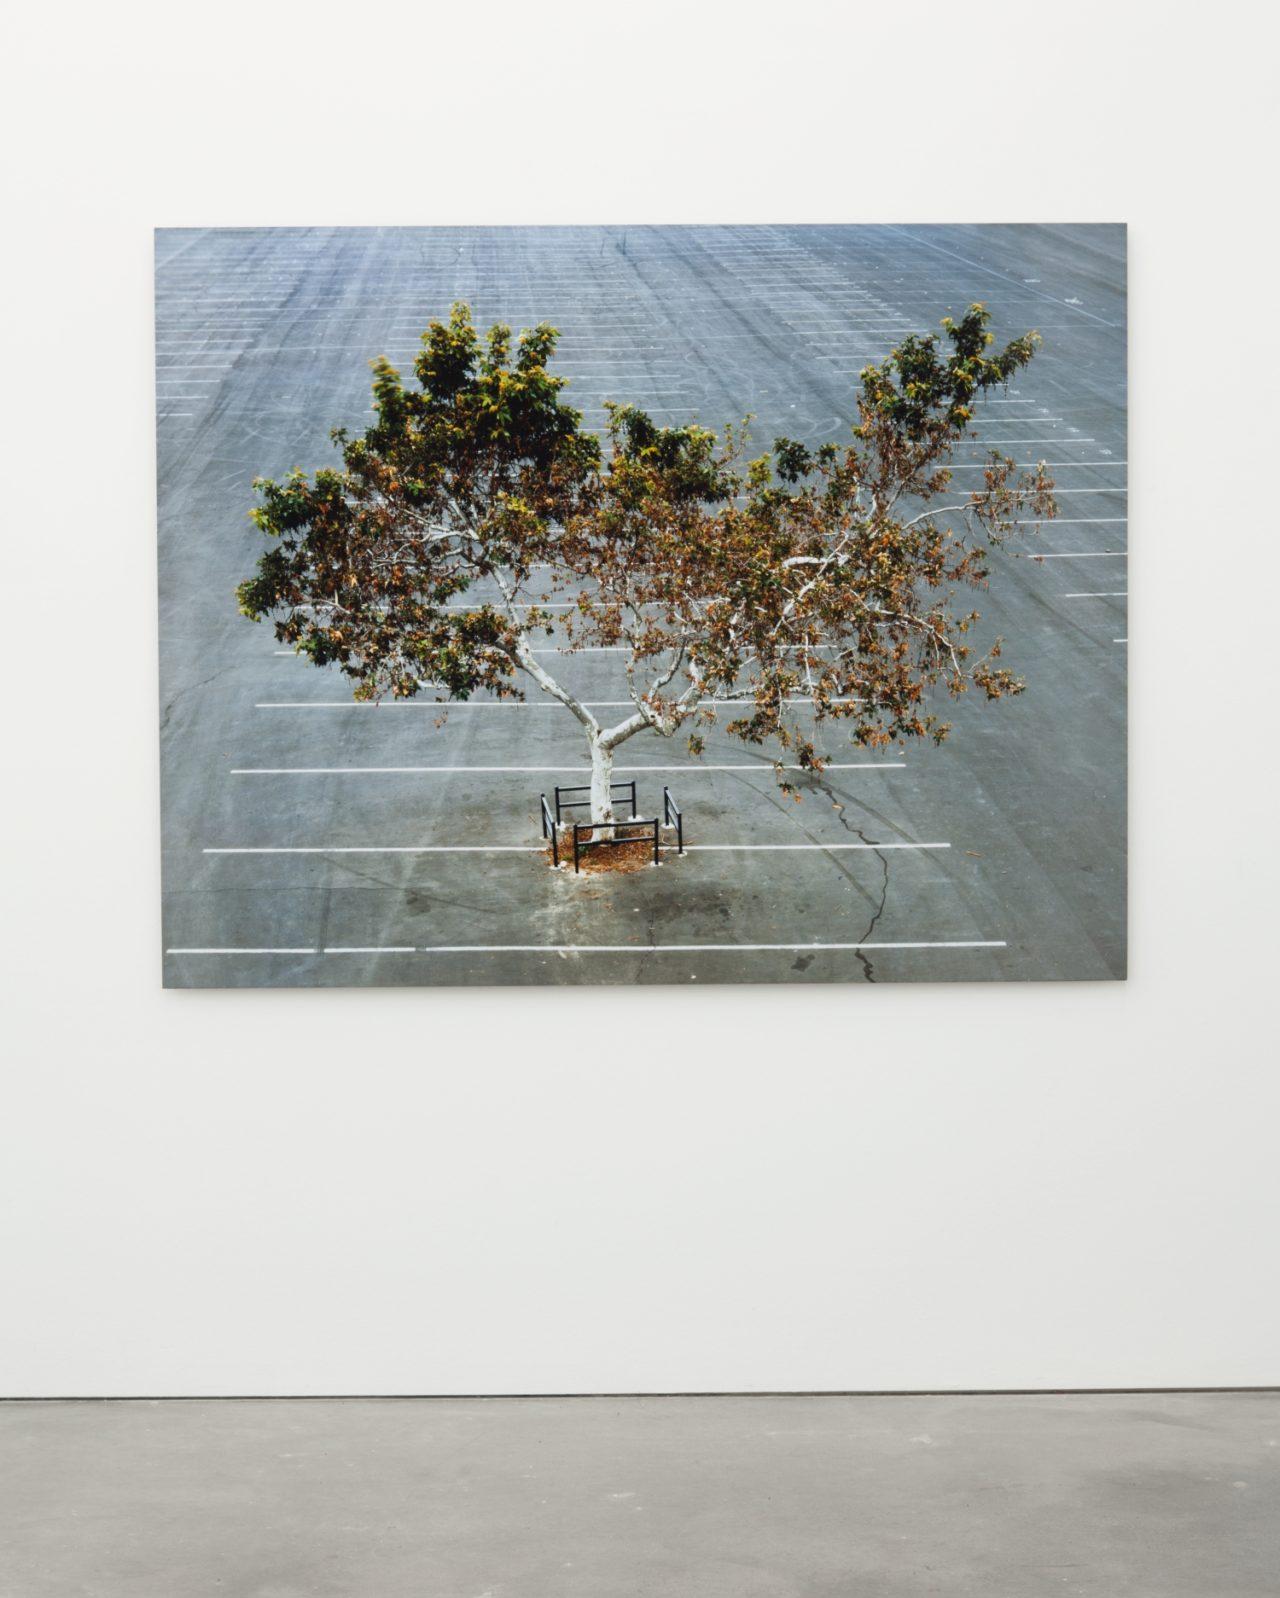 Joel Tauber, My lonley tree (2006)